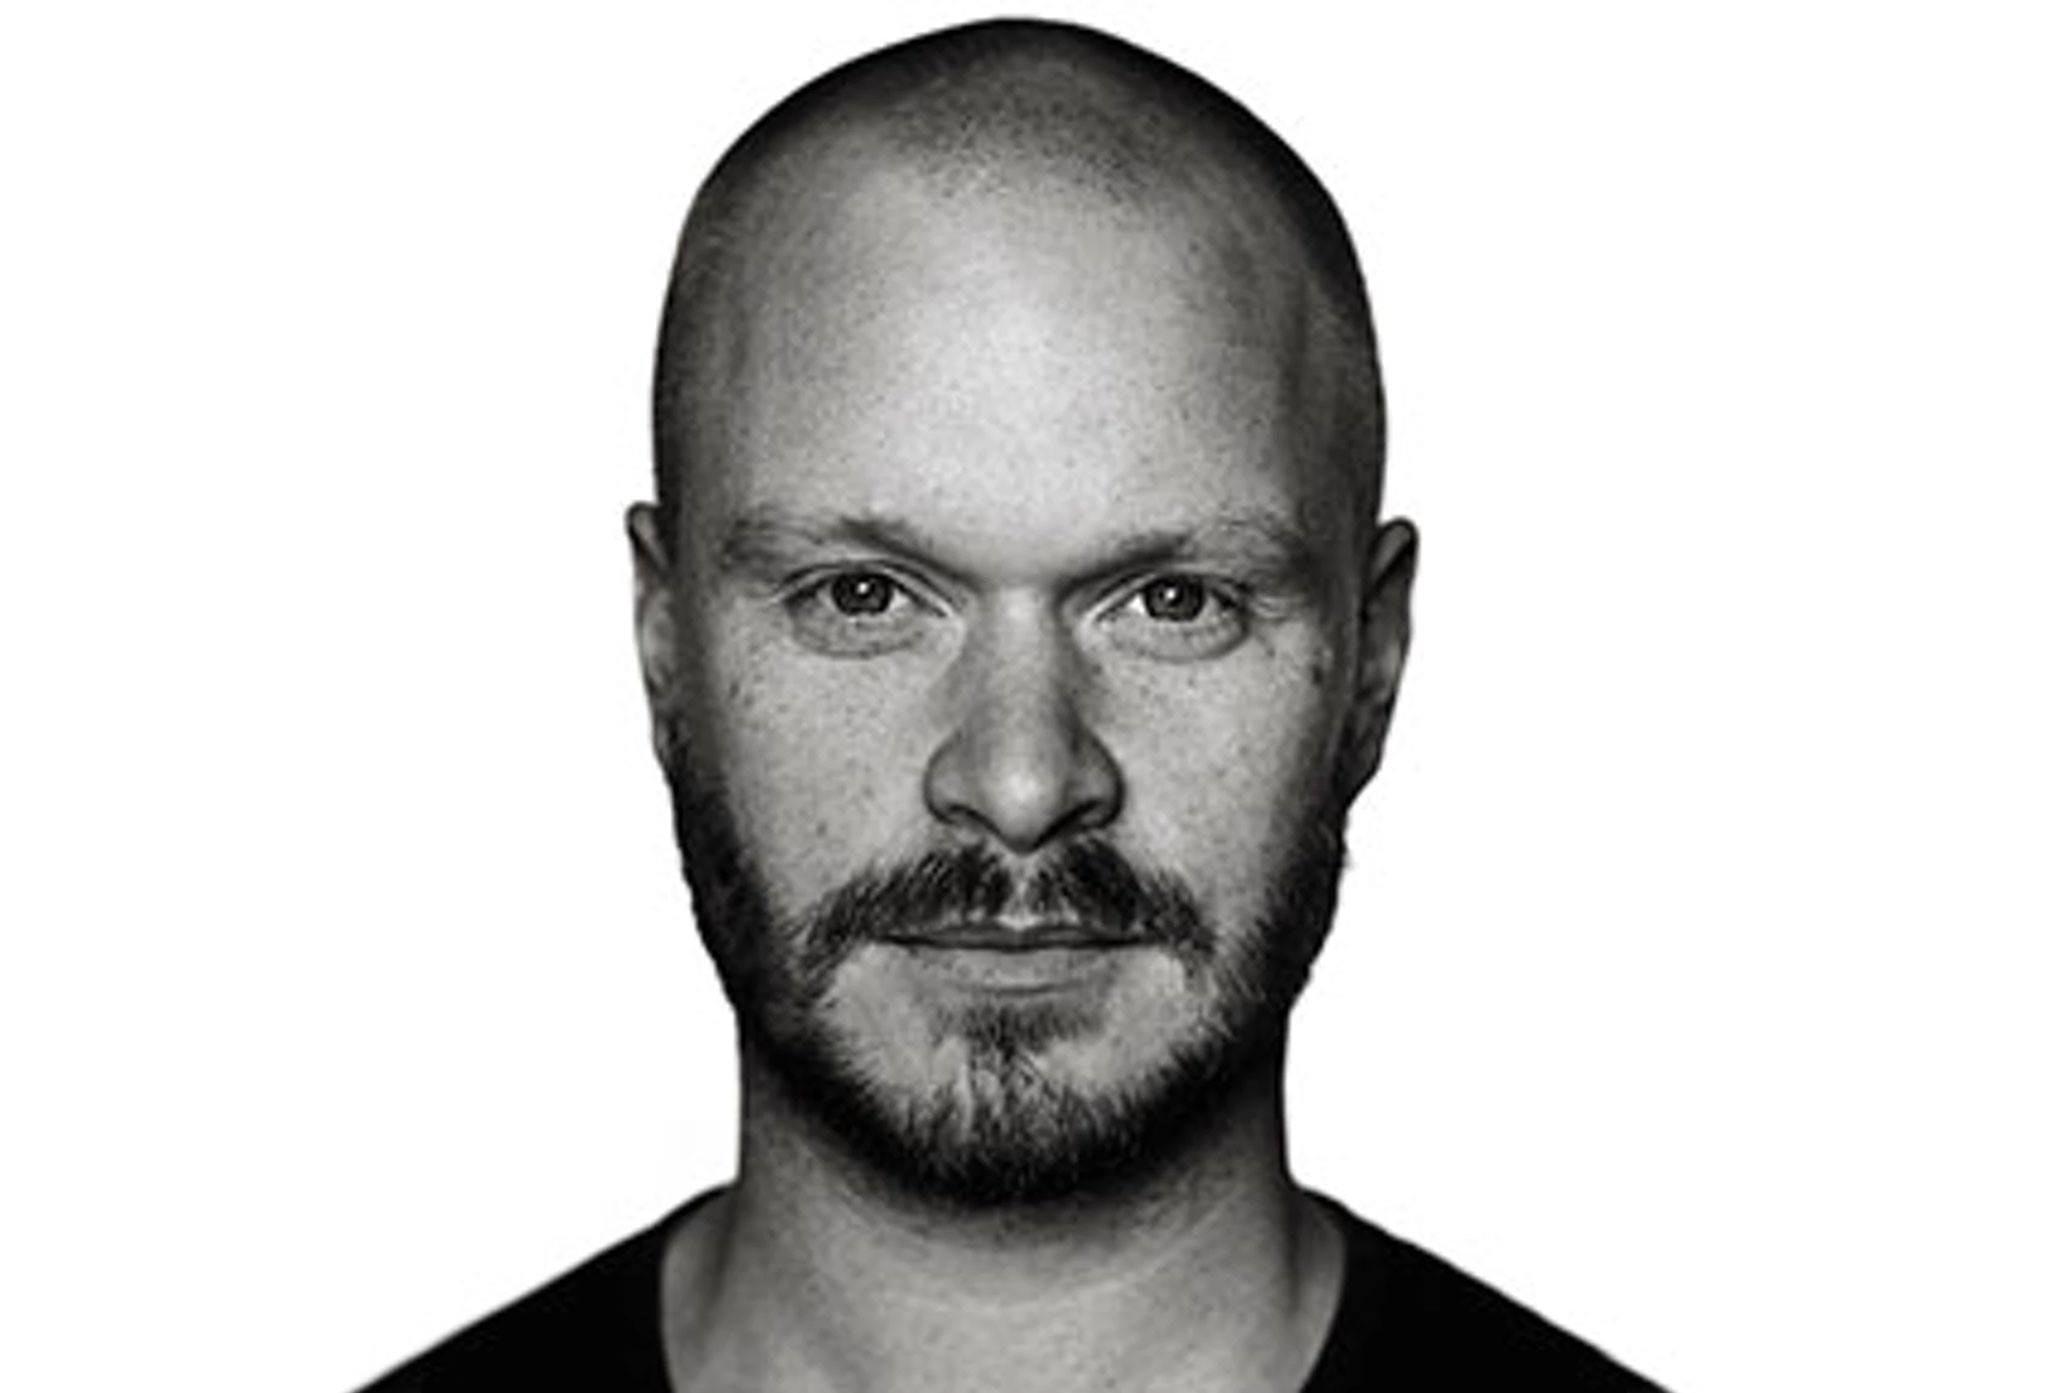 Kári Viðarsson, actor and director of The Freezer